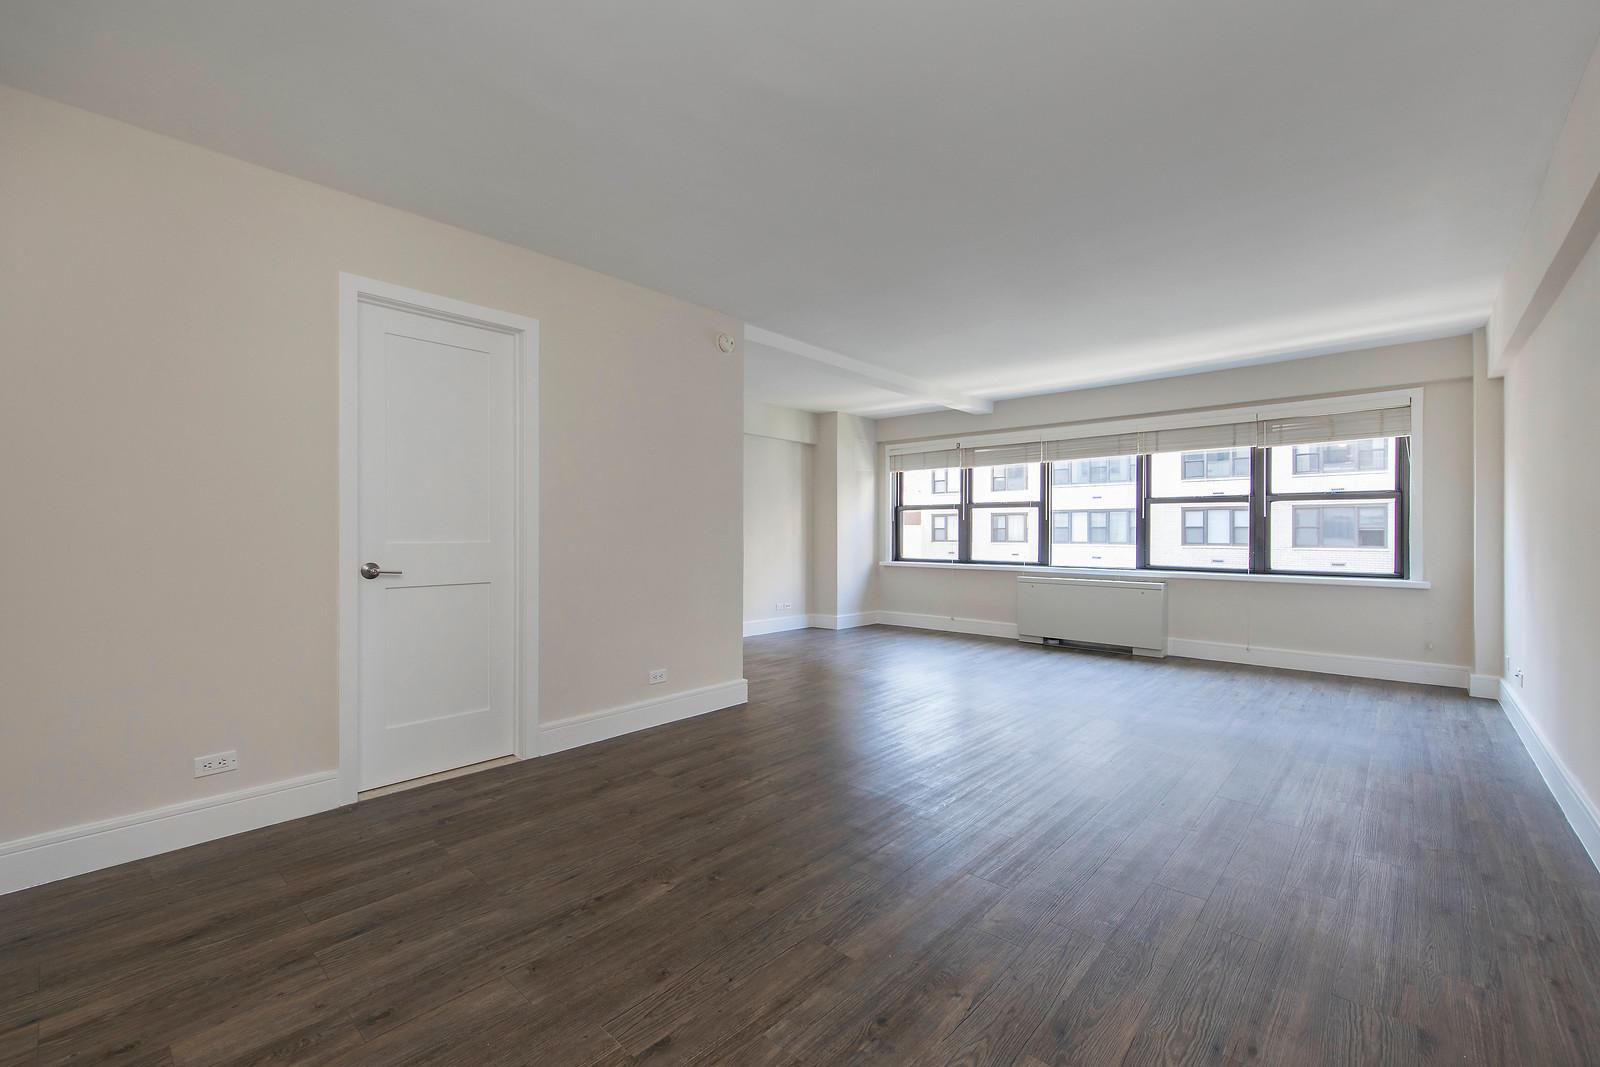 225 East 63rd Street, Apt 11E, Manhattan, New York 10065